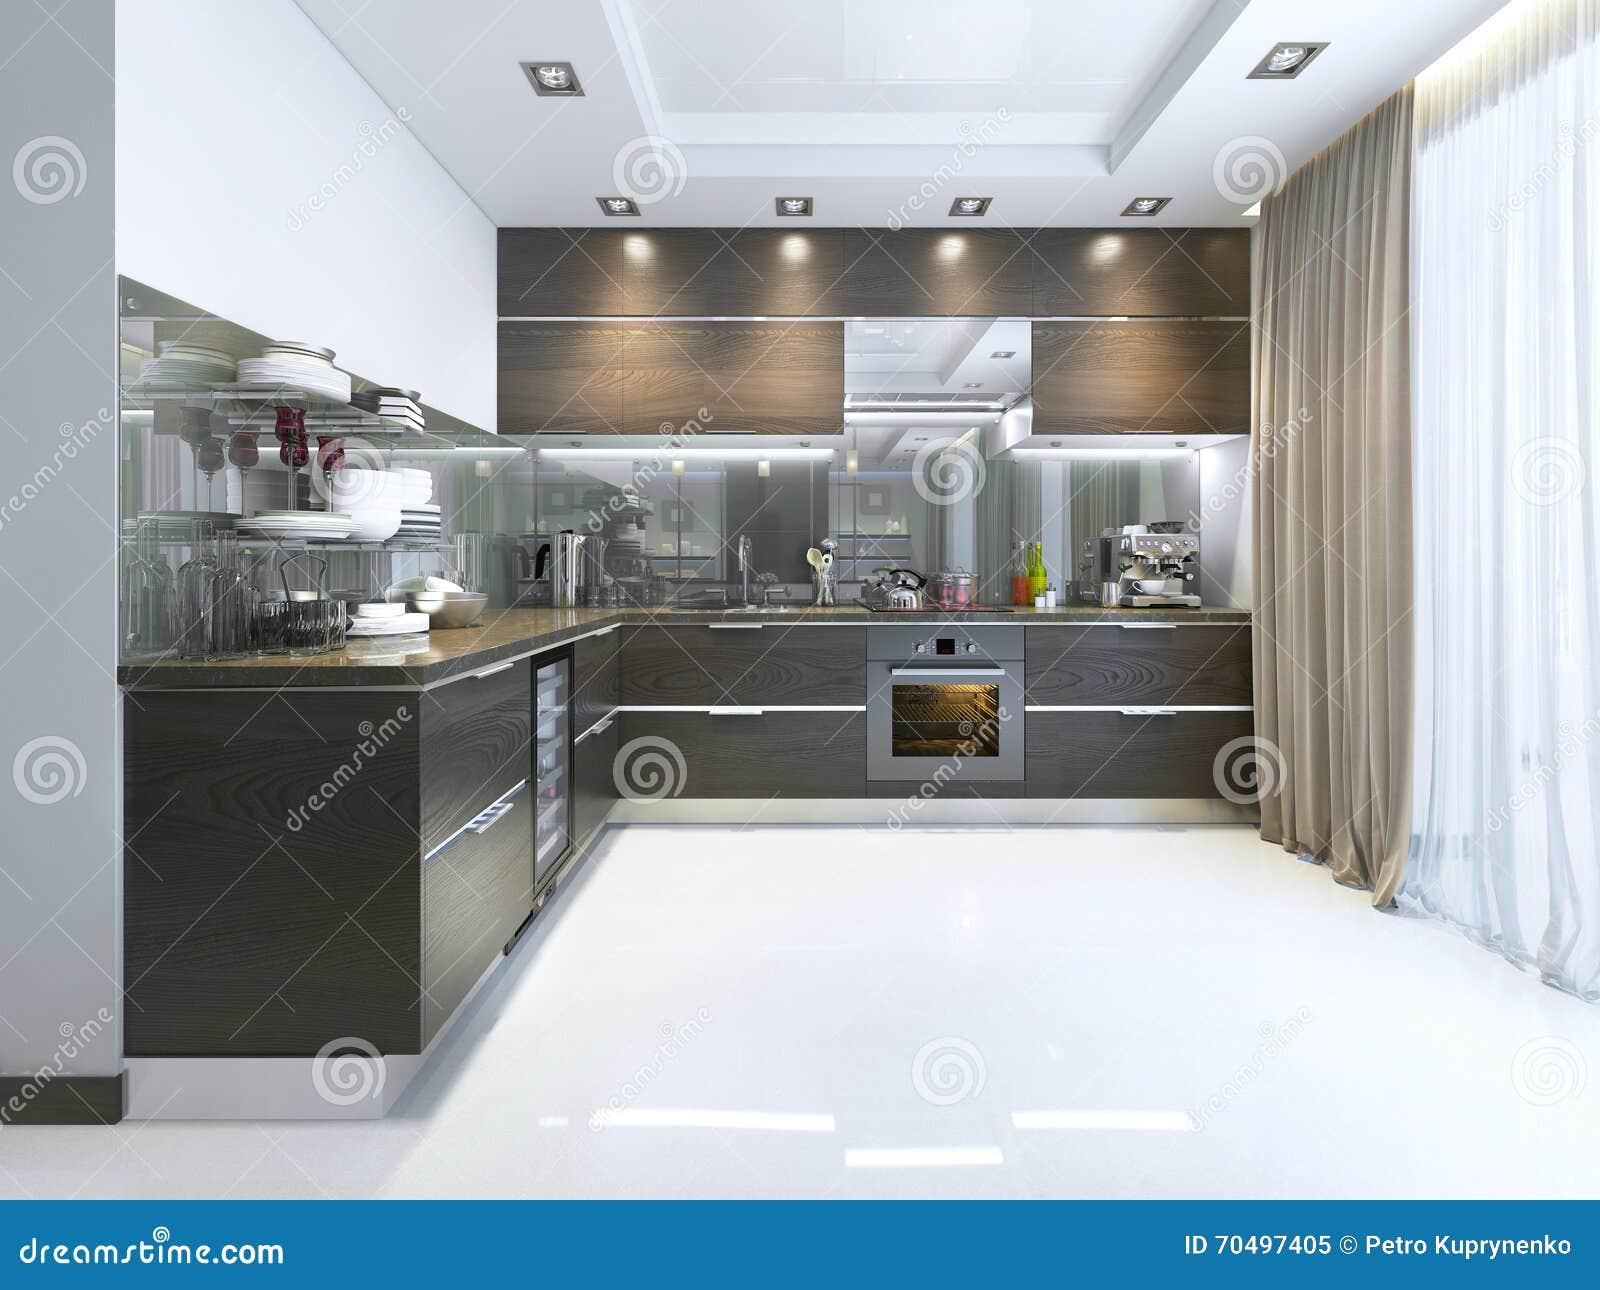 Keuken ontwerp marmer - Keuken wit marmer ...